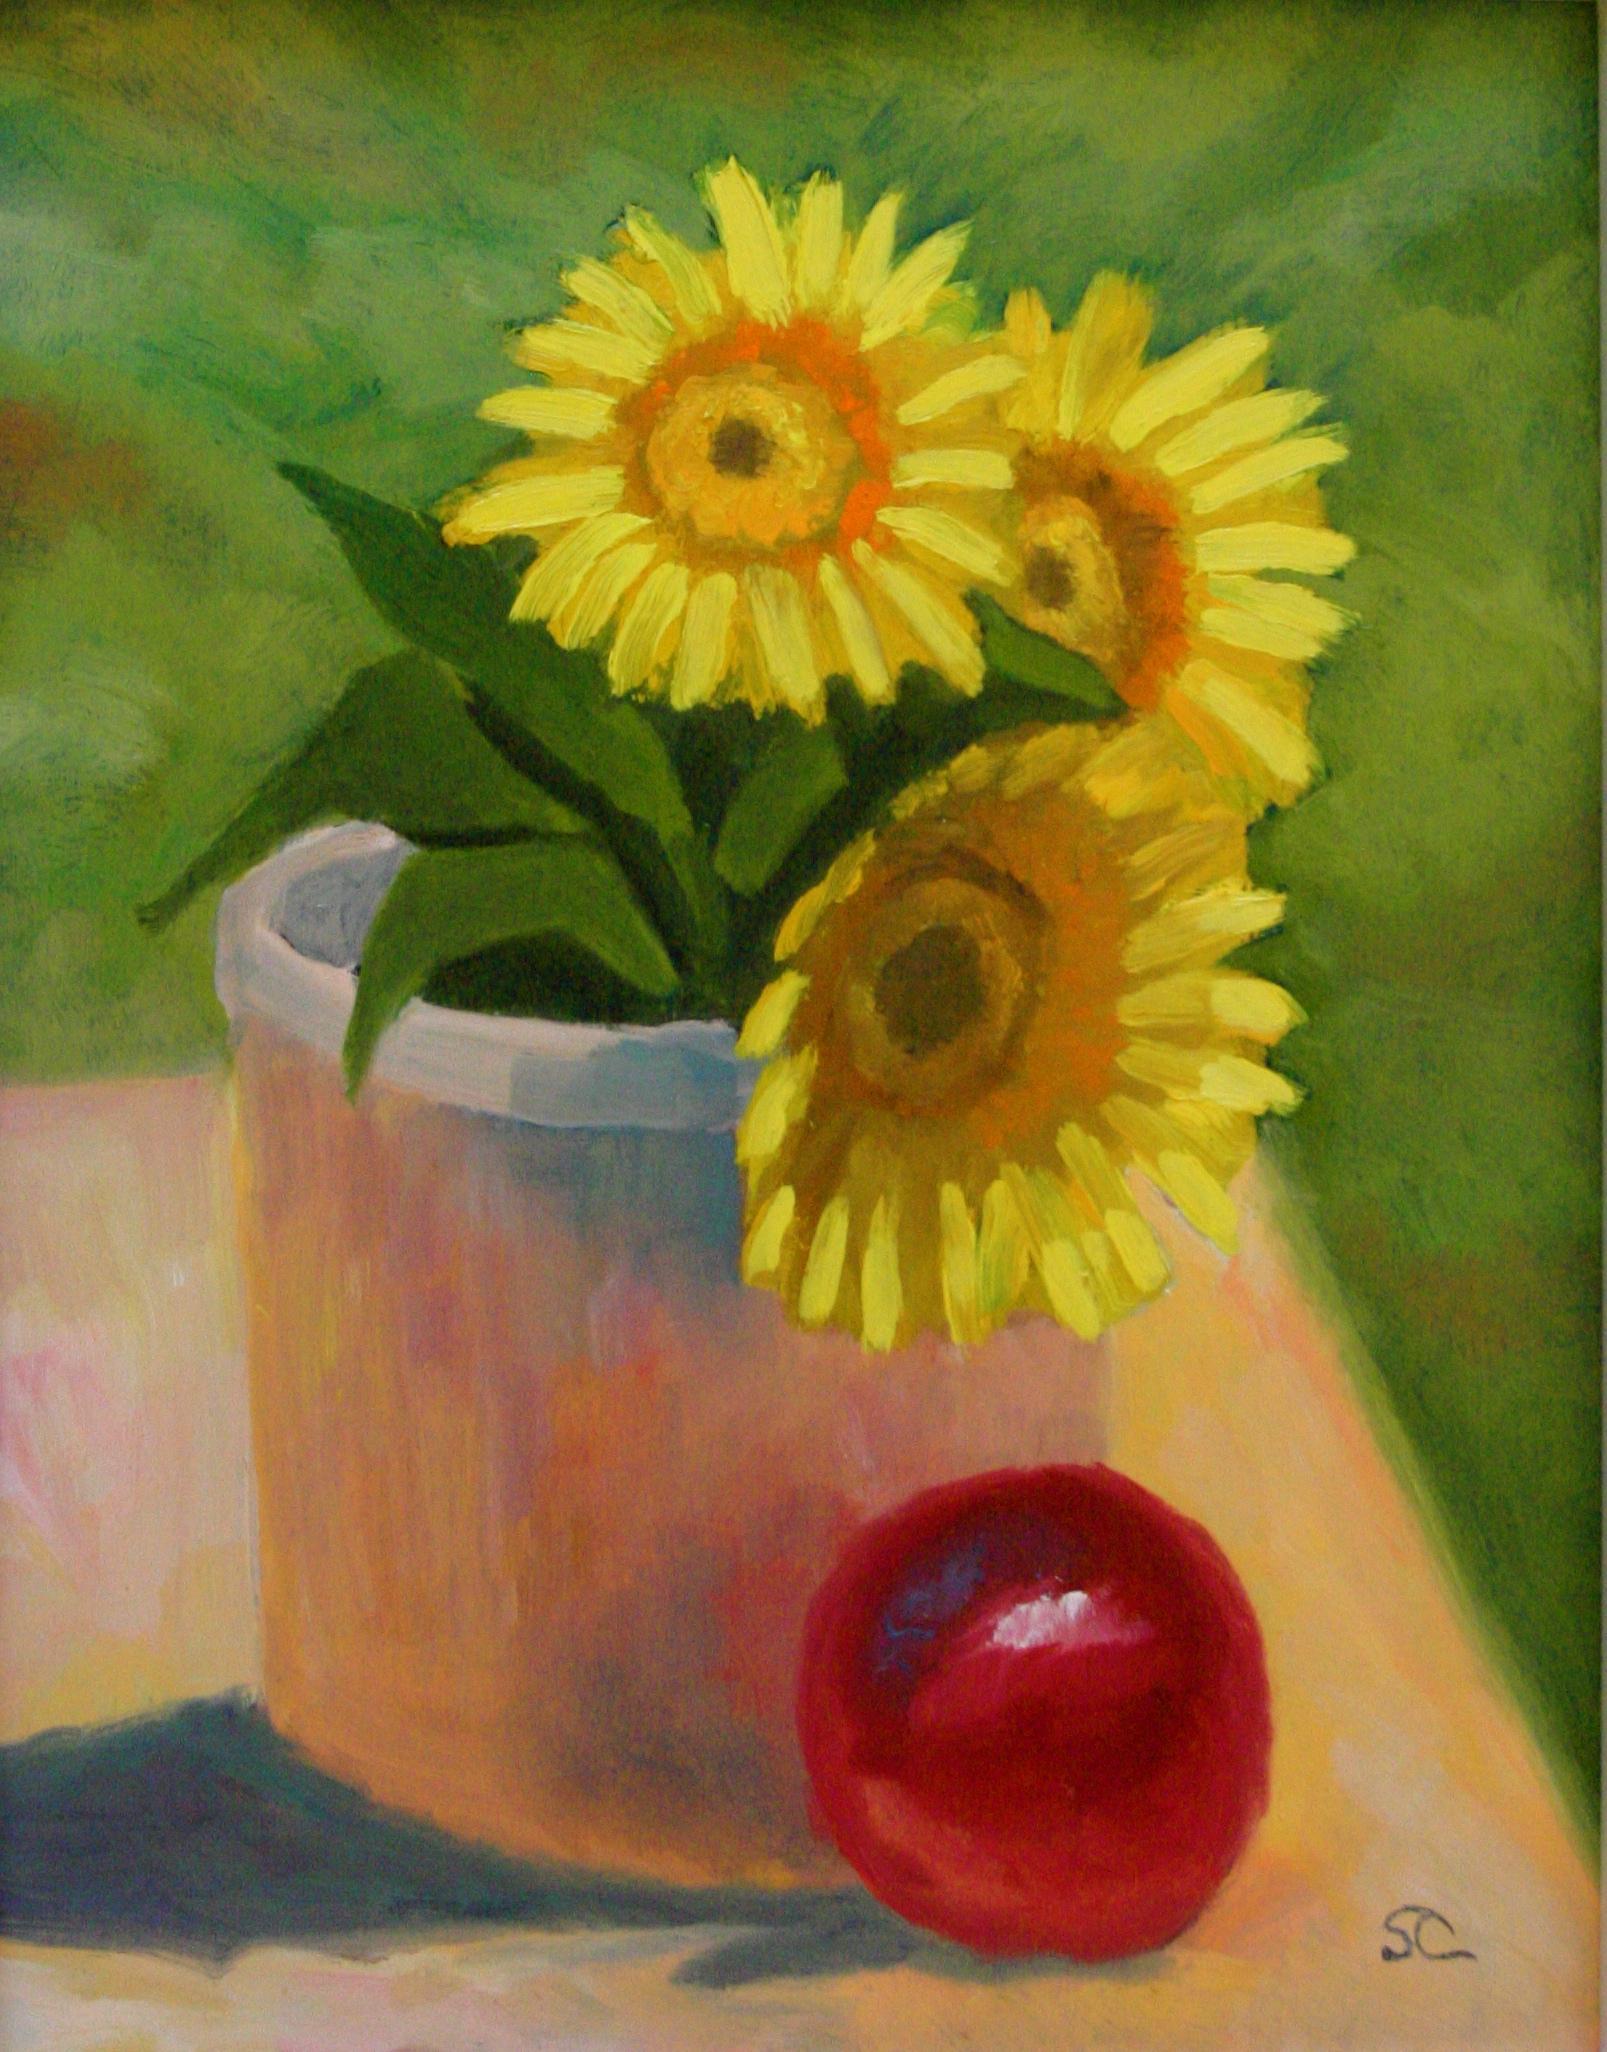 """Sunflowers"" oil on panel 12 x 16"